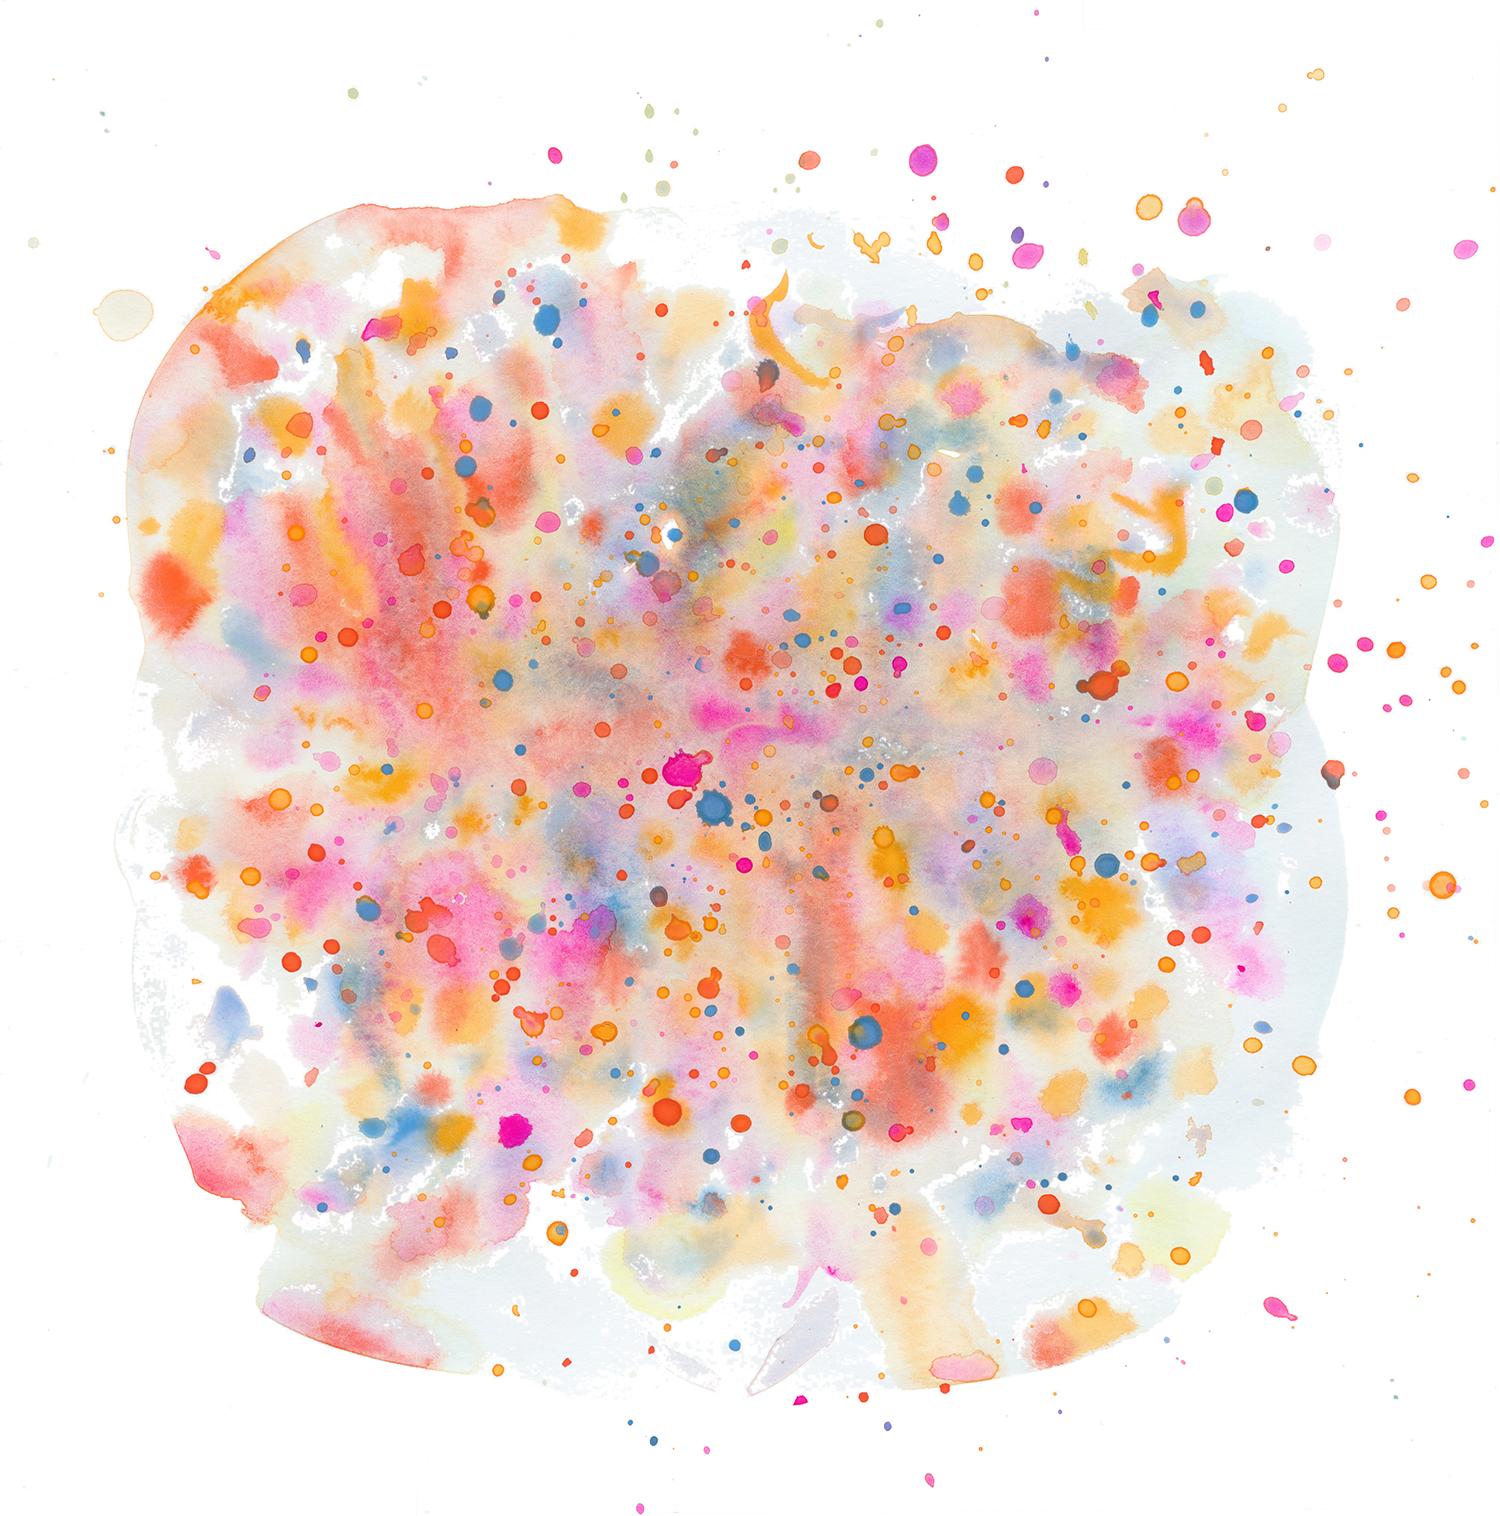 splatterwash.jpg